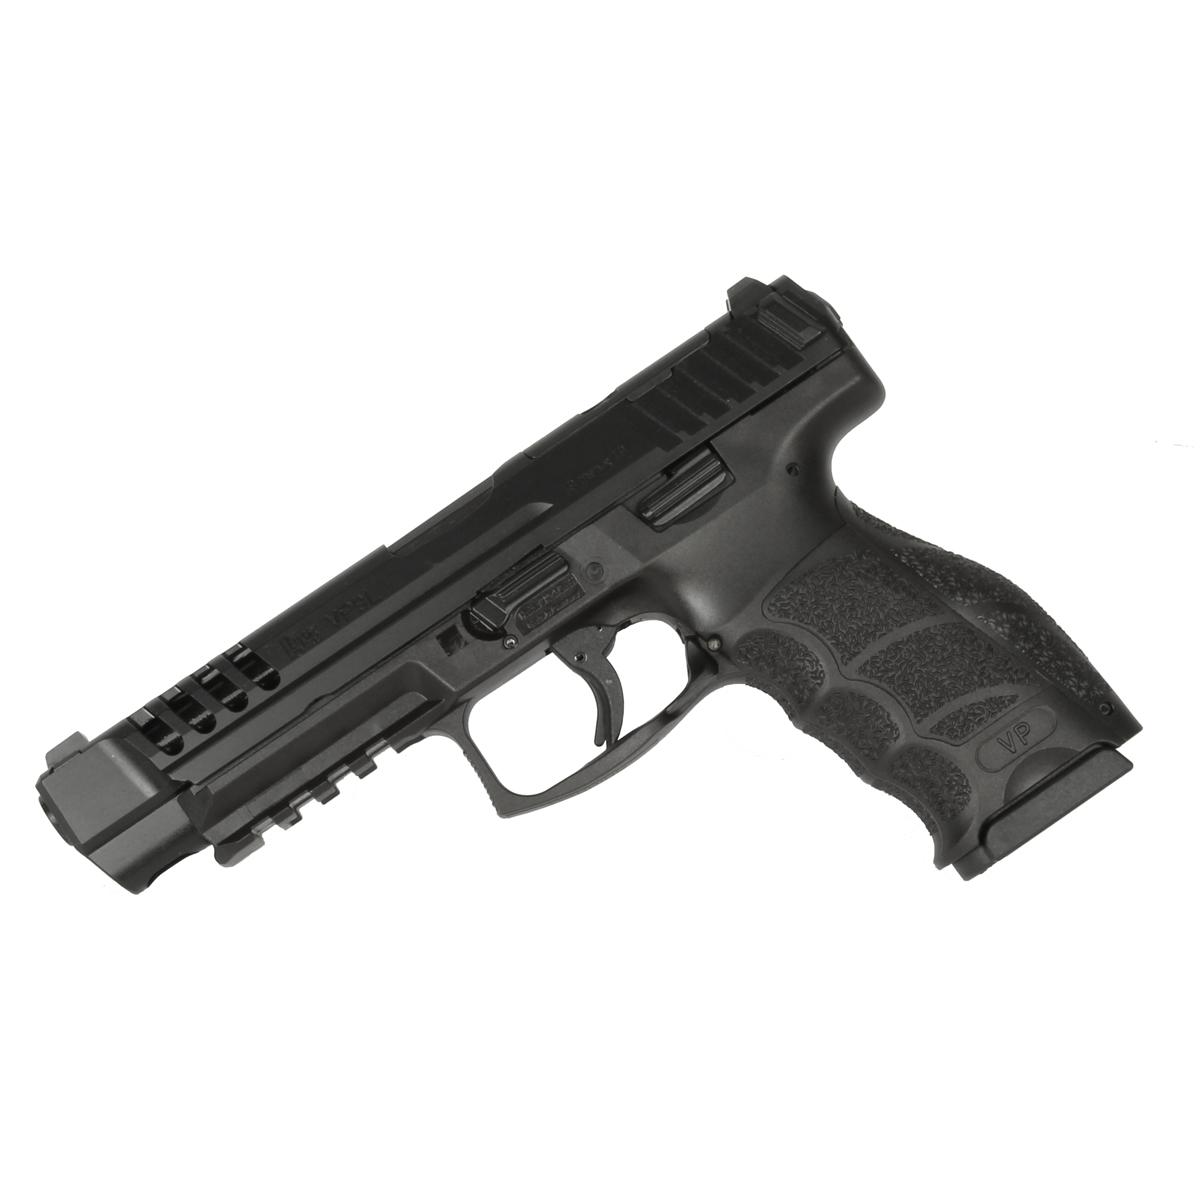 H&K VP9L Optics Ready 9mm Striker Fired, Fixed Sights - 10 ROUND